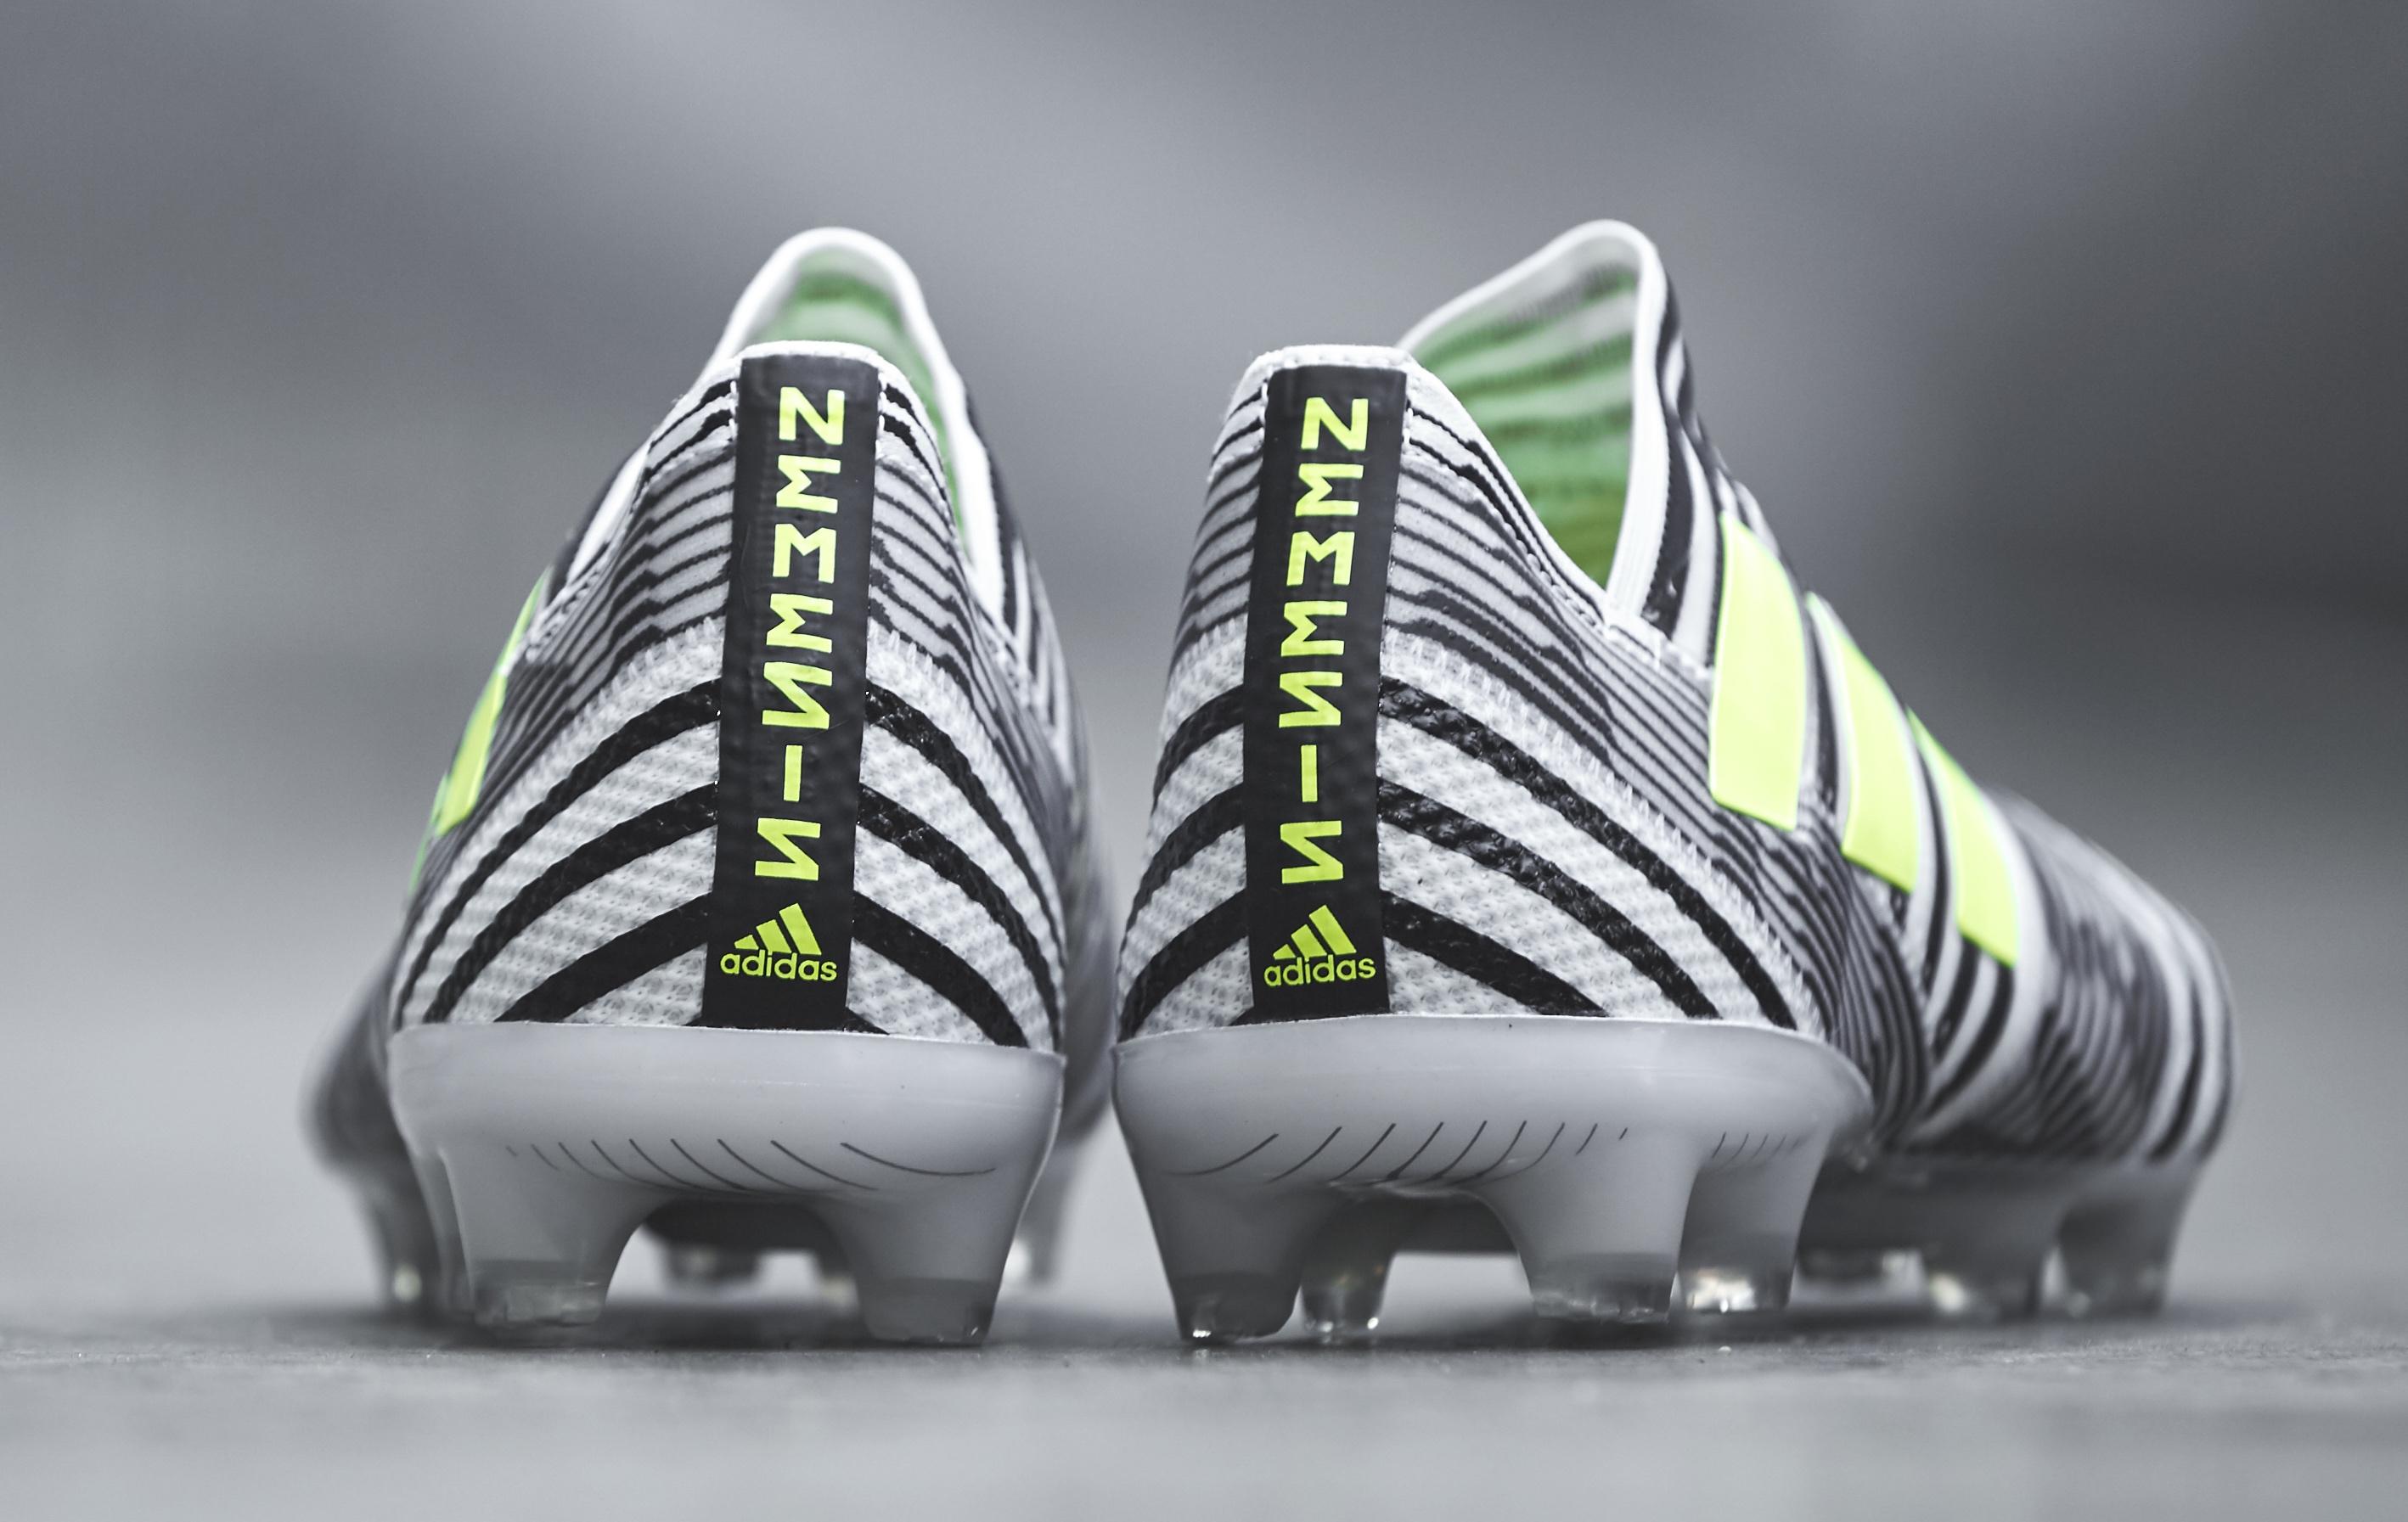 adidas Launches Nemeziz Soccer Cleat for Stars Leo Messi Renato Sanches and Roberto Firmino